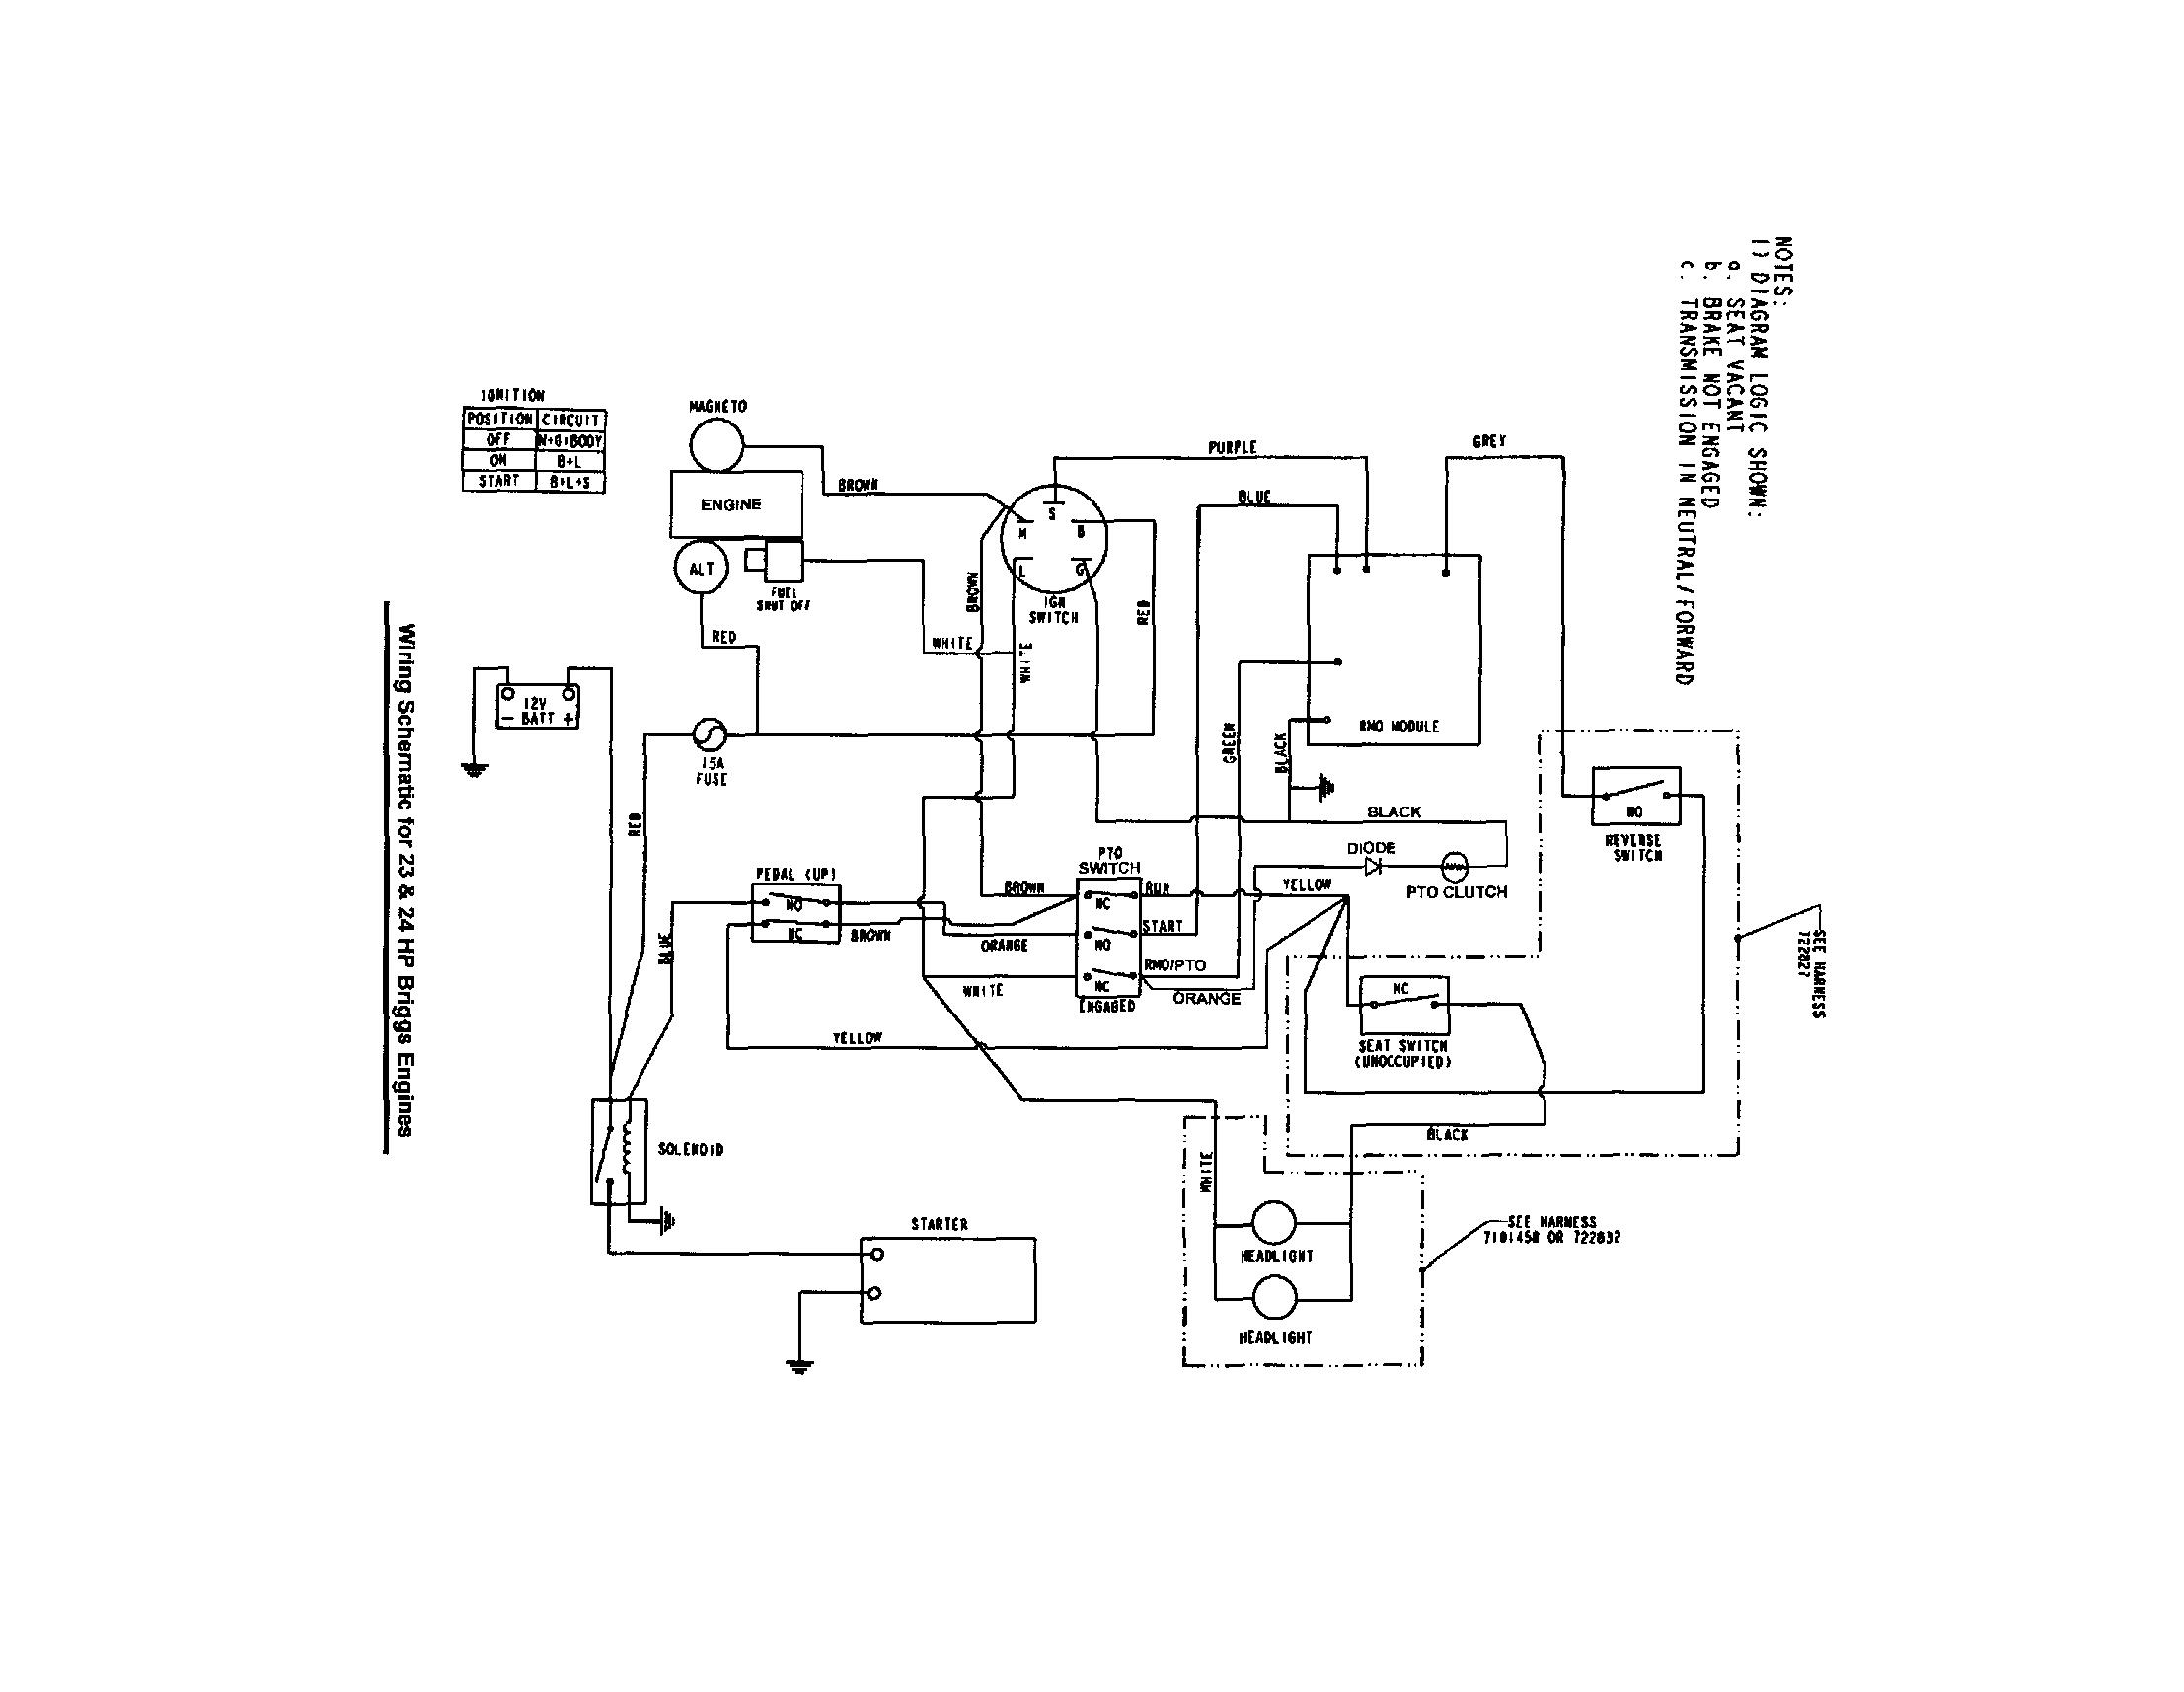 hight resolution of snapper lt160h42cbv2 wiring harness wiring diagram 15488 snapper wiring harness